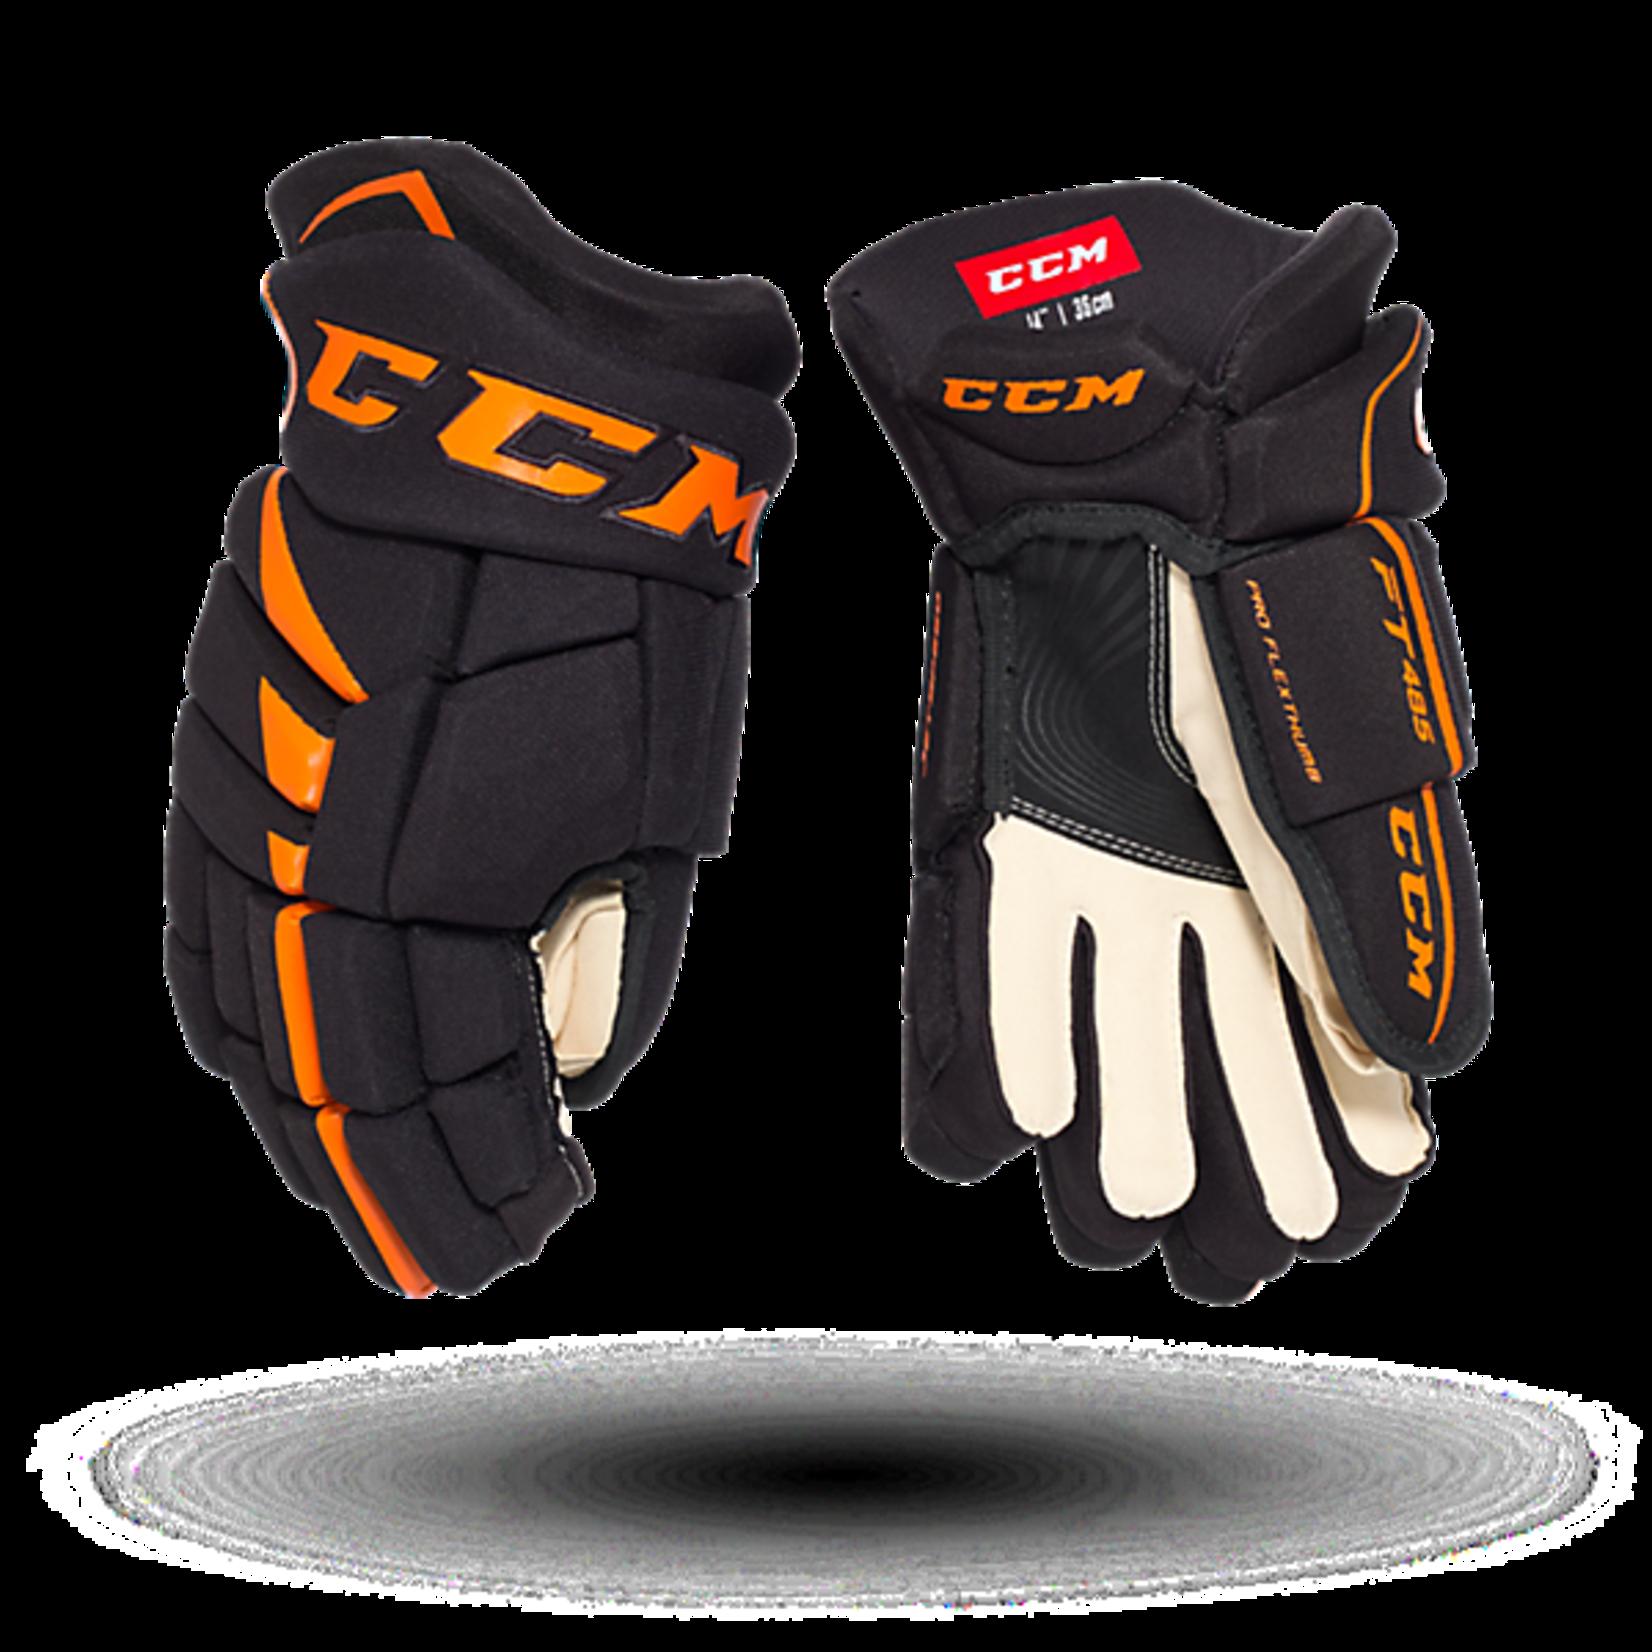 CCM CCM Hockey Gloves, Jetspeed FT485, Senior